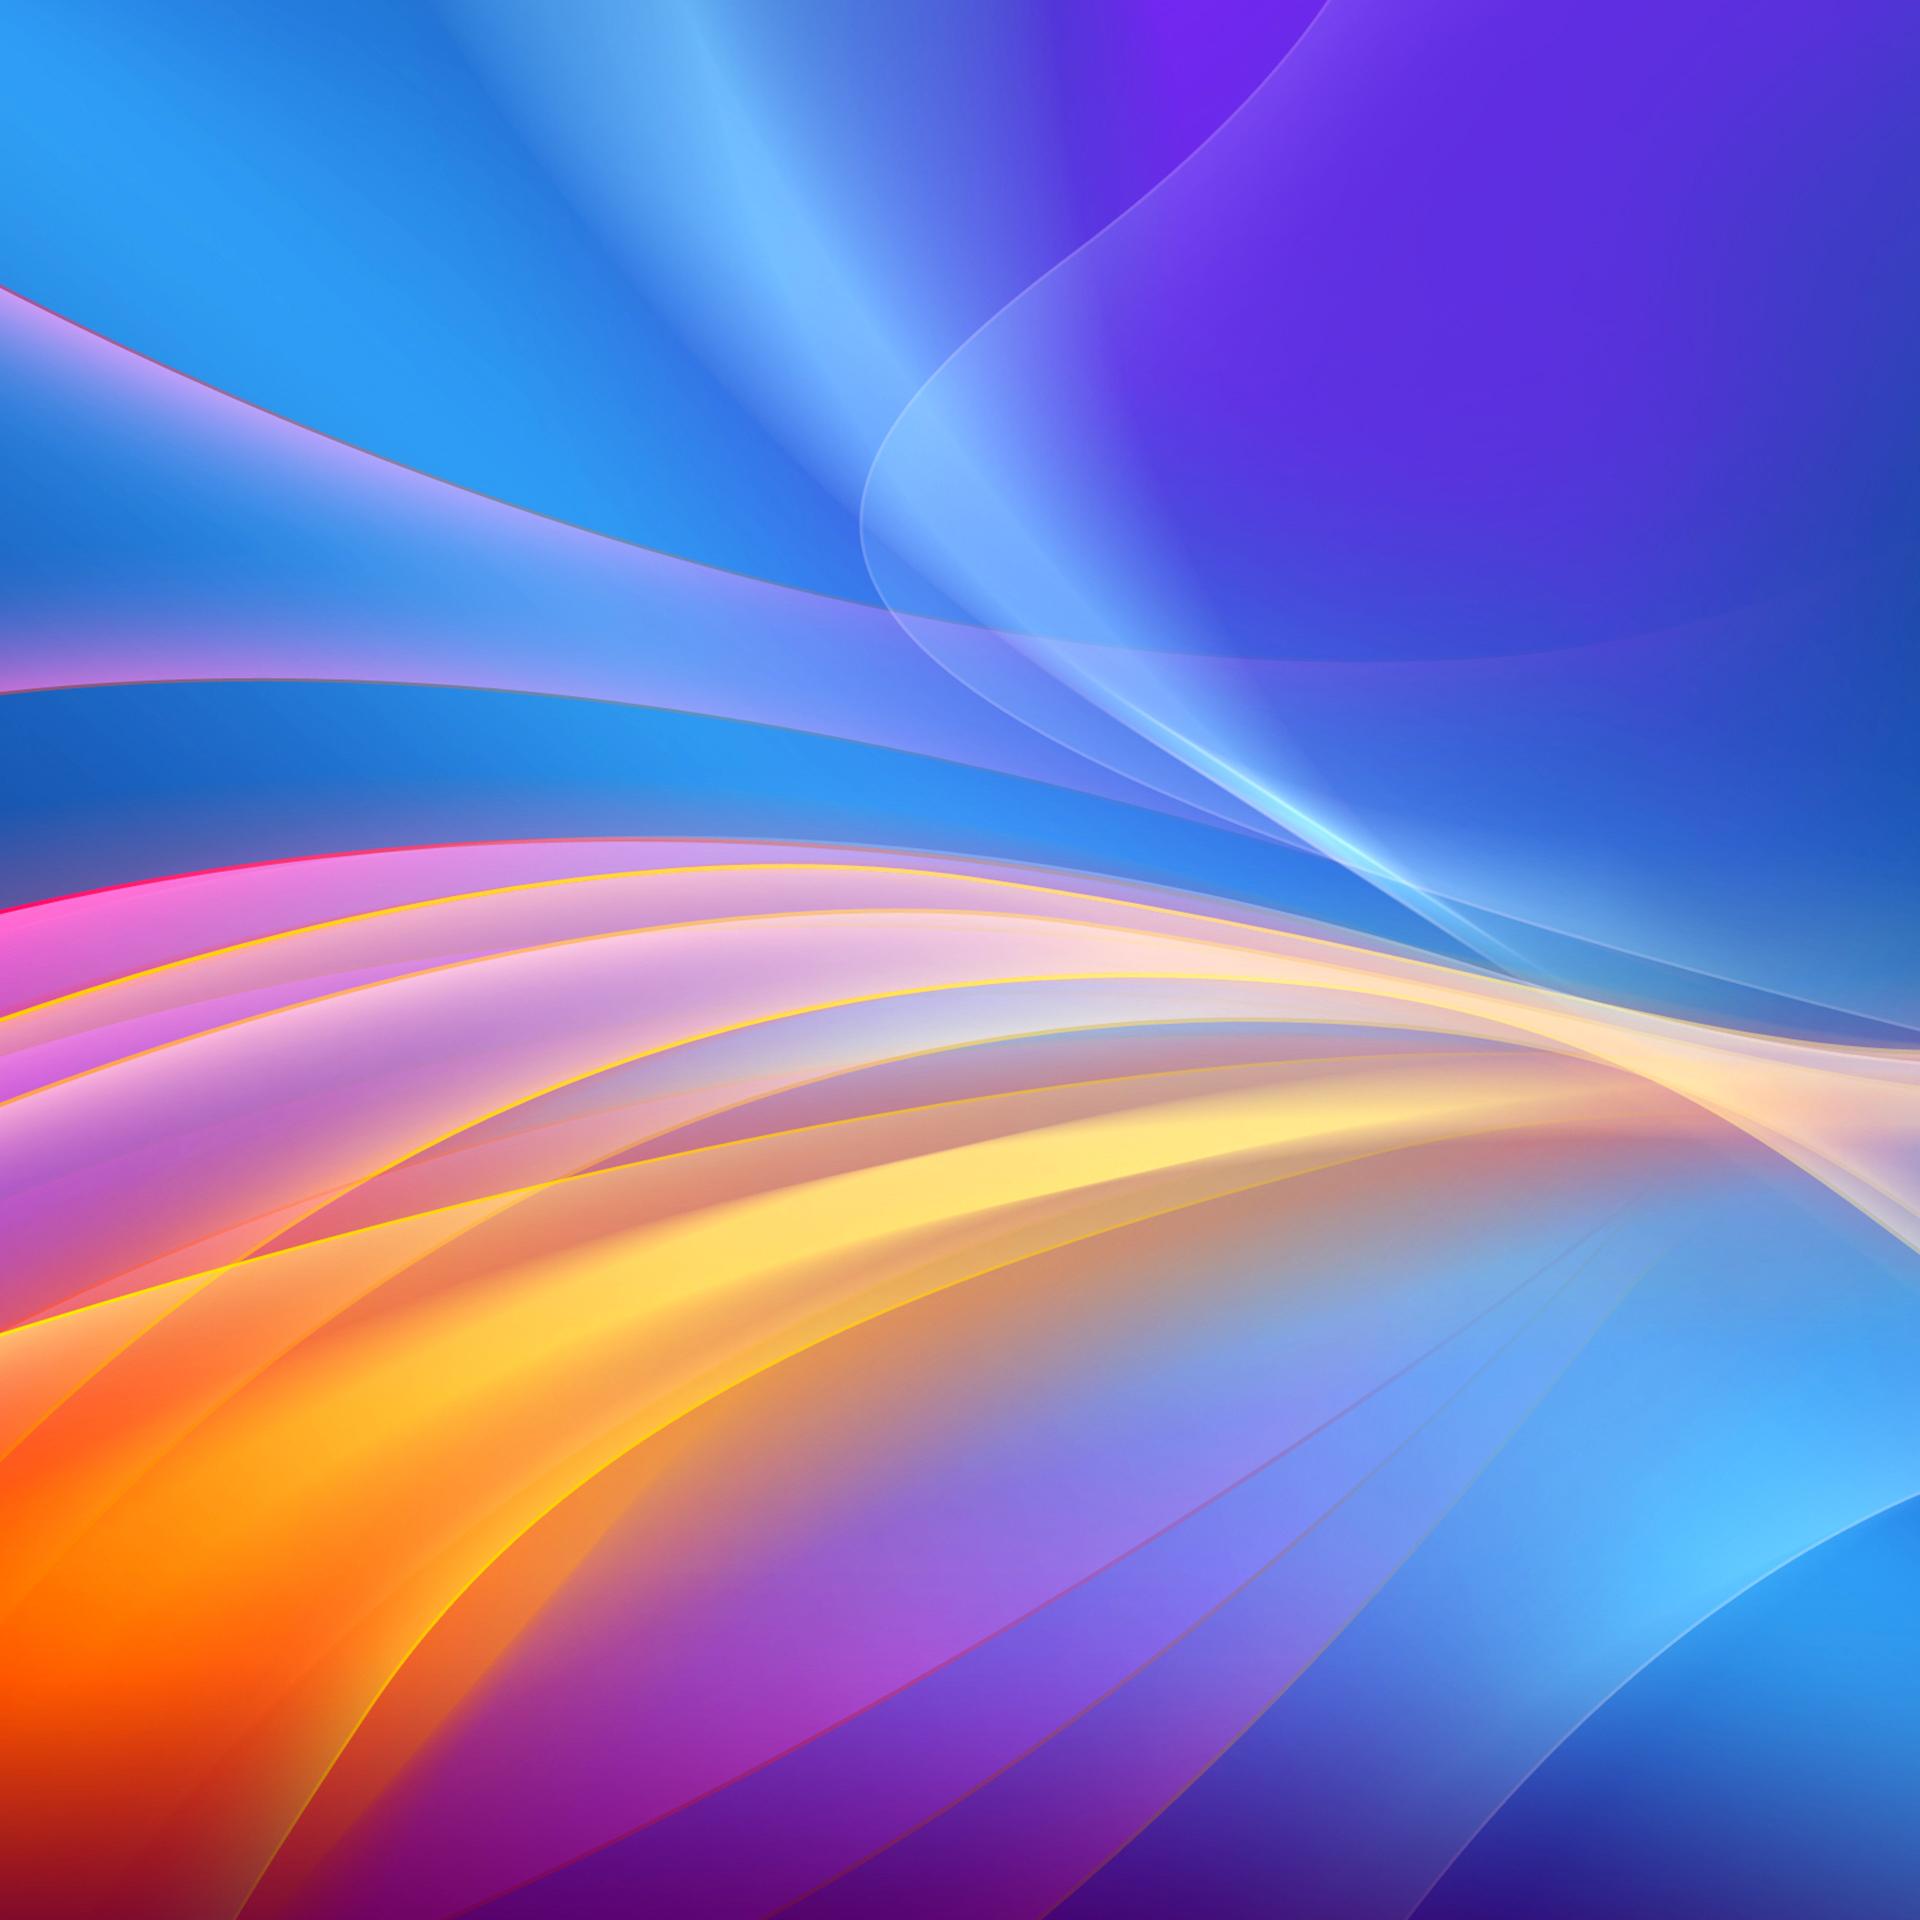 Ios 6 Wallpaper Hd Download Huawei Mediapad M2 Stock Wallpapers Full Hd